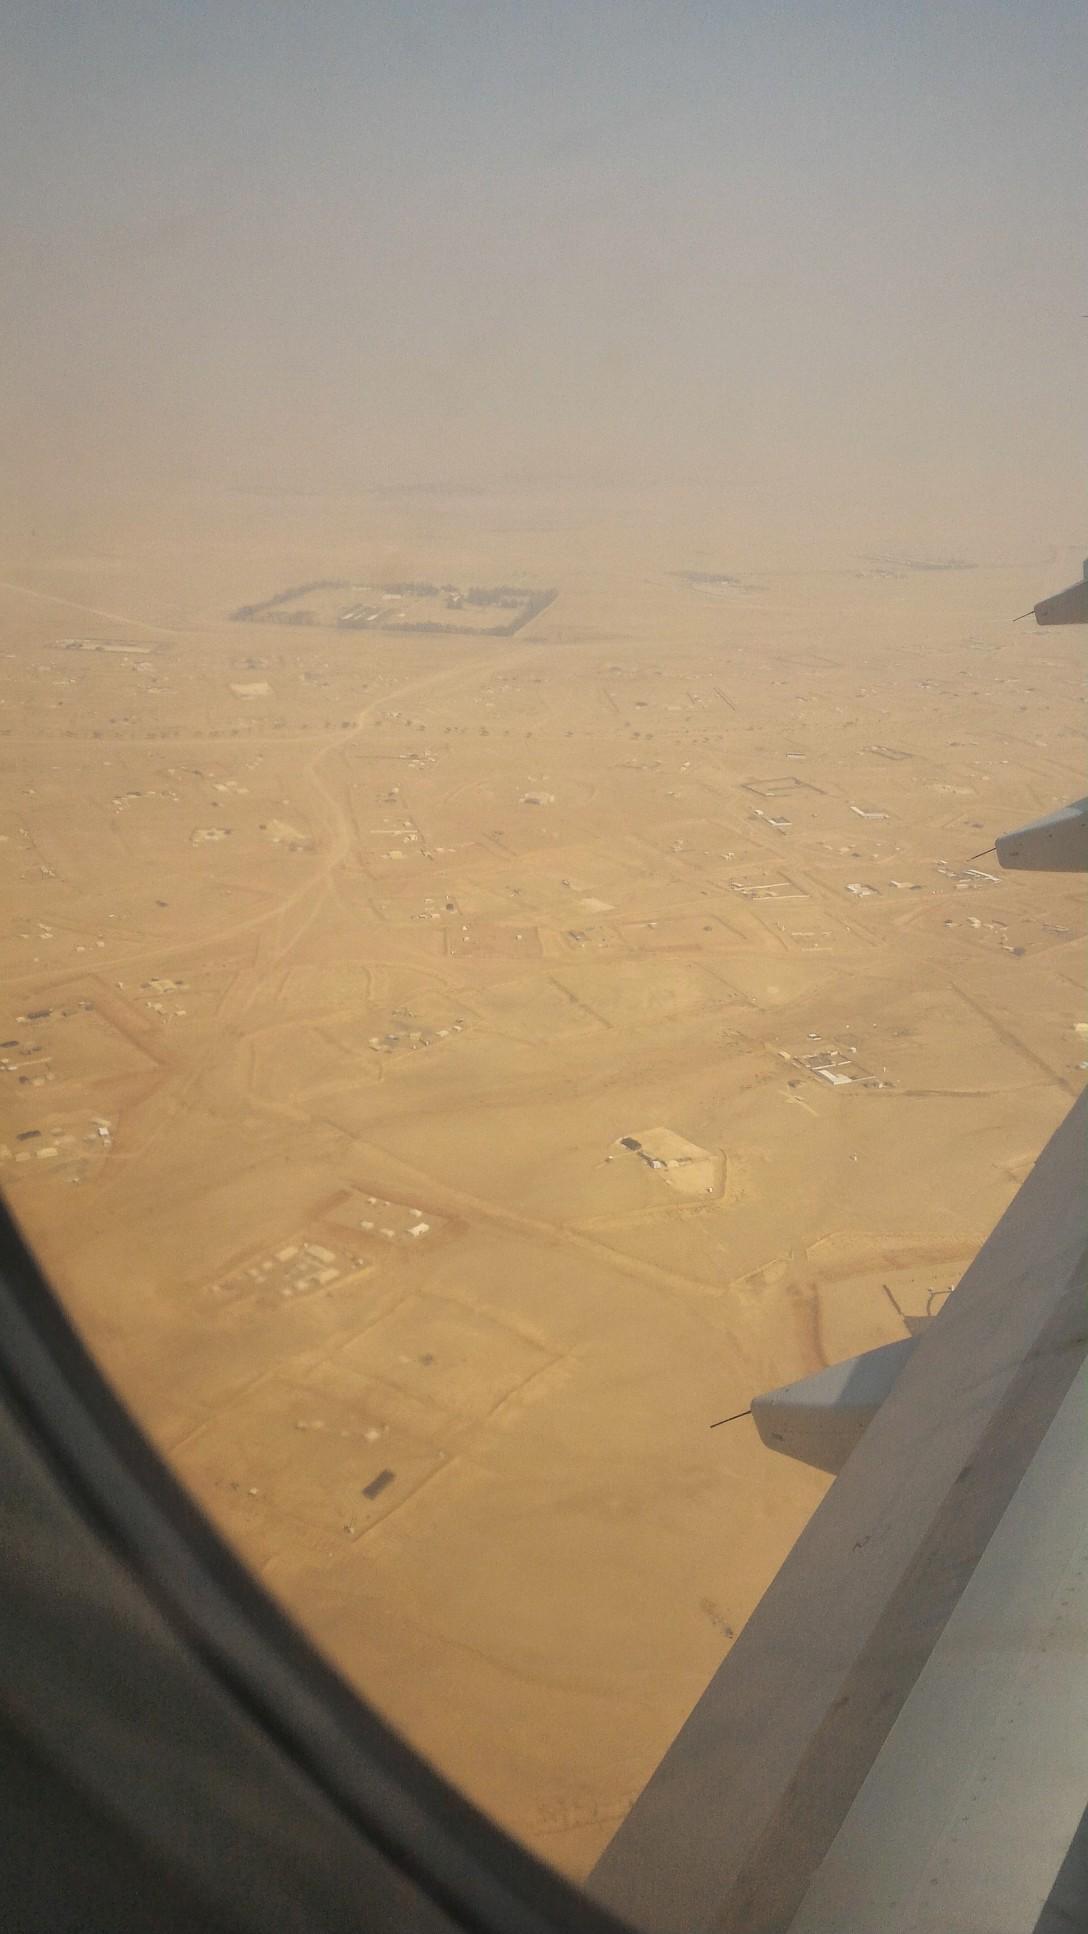 View of area around Riyadh--all desert